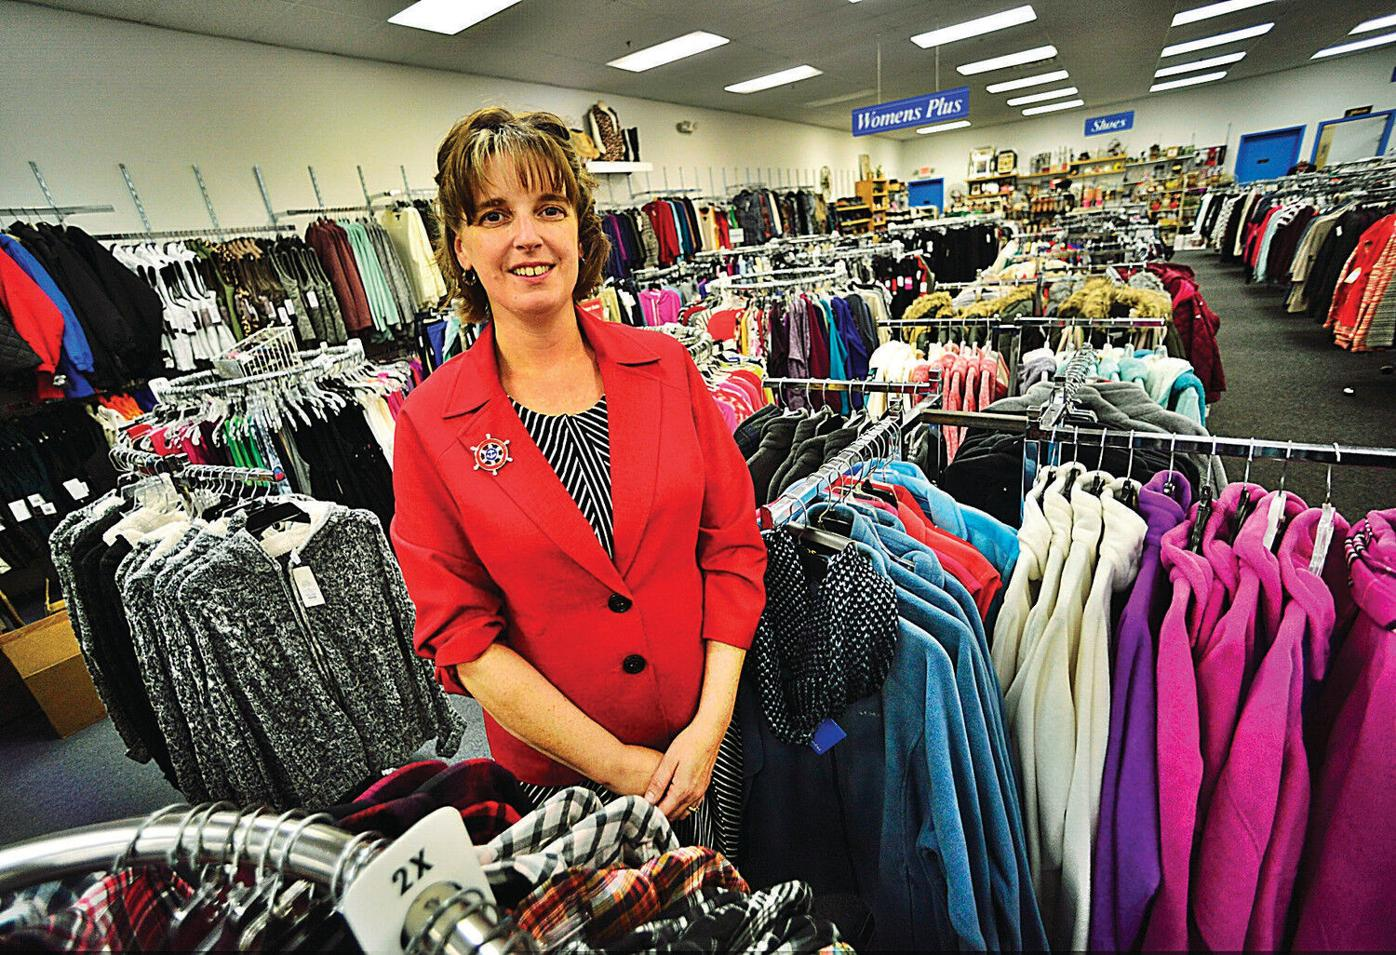 Label Shopper manager exemplifies Spirit of ADA